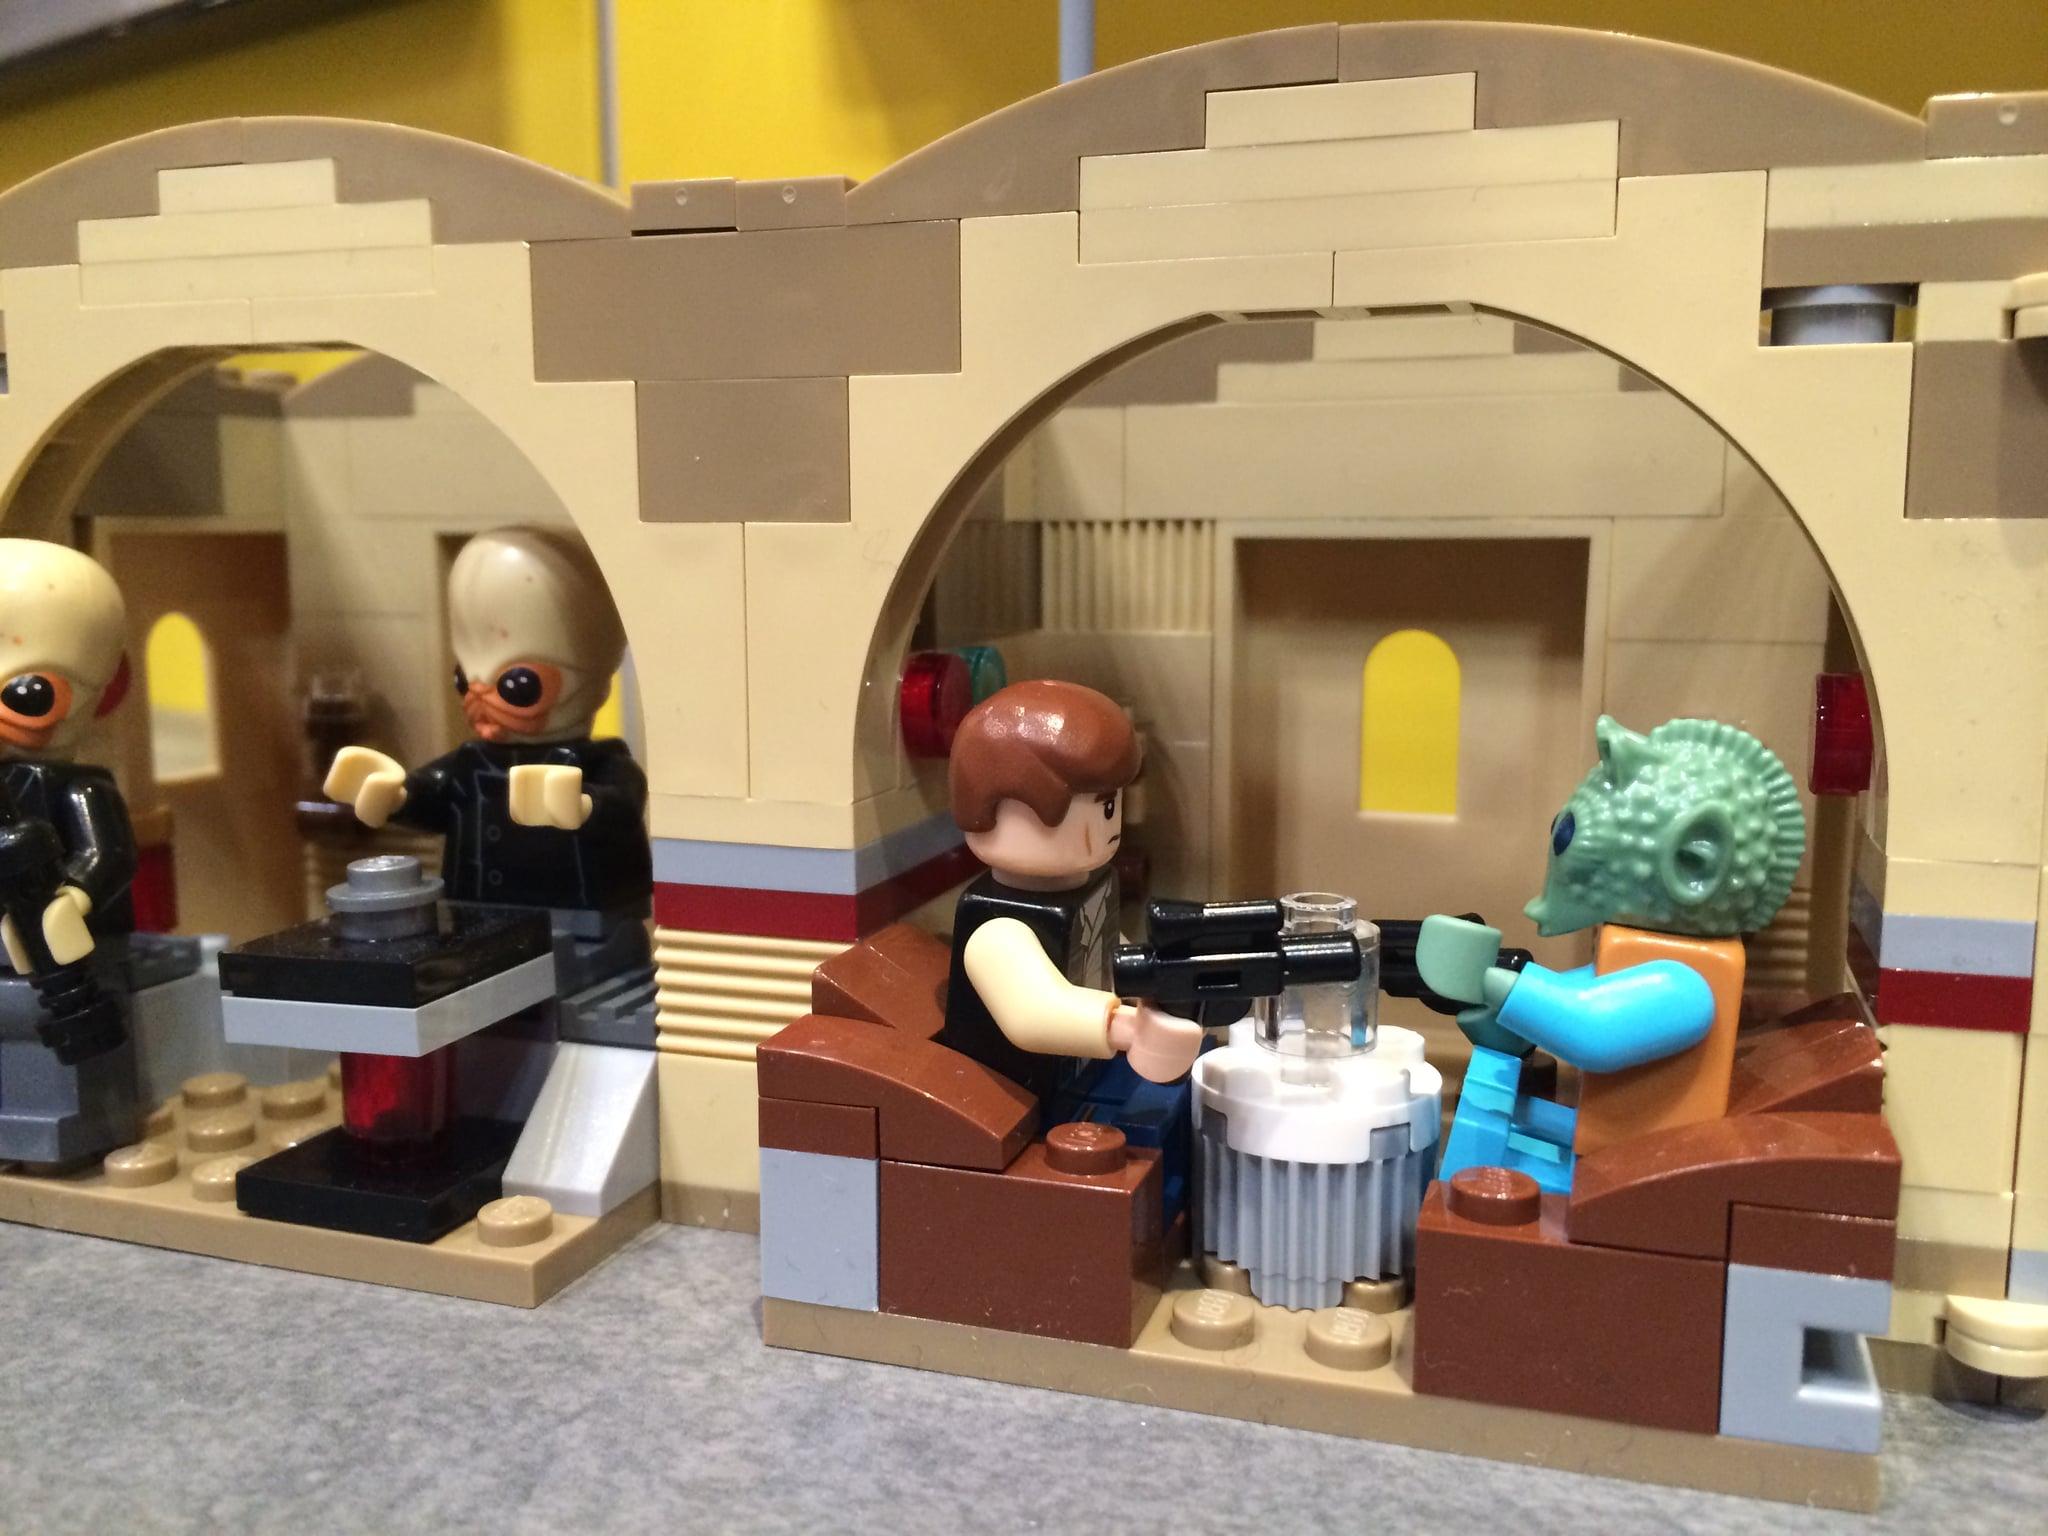 Lego Star Wars Mos Eisley Cantina